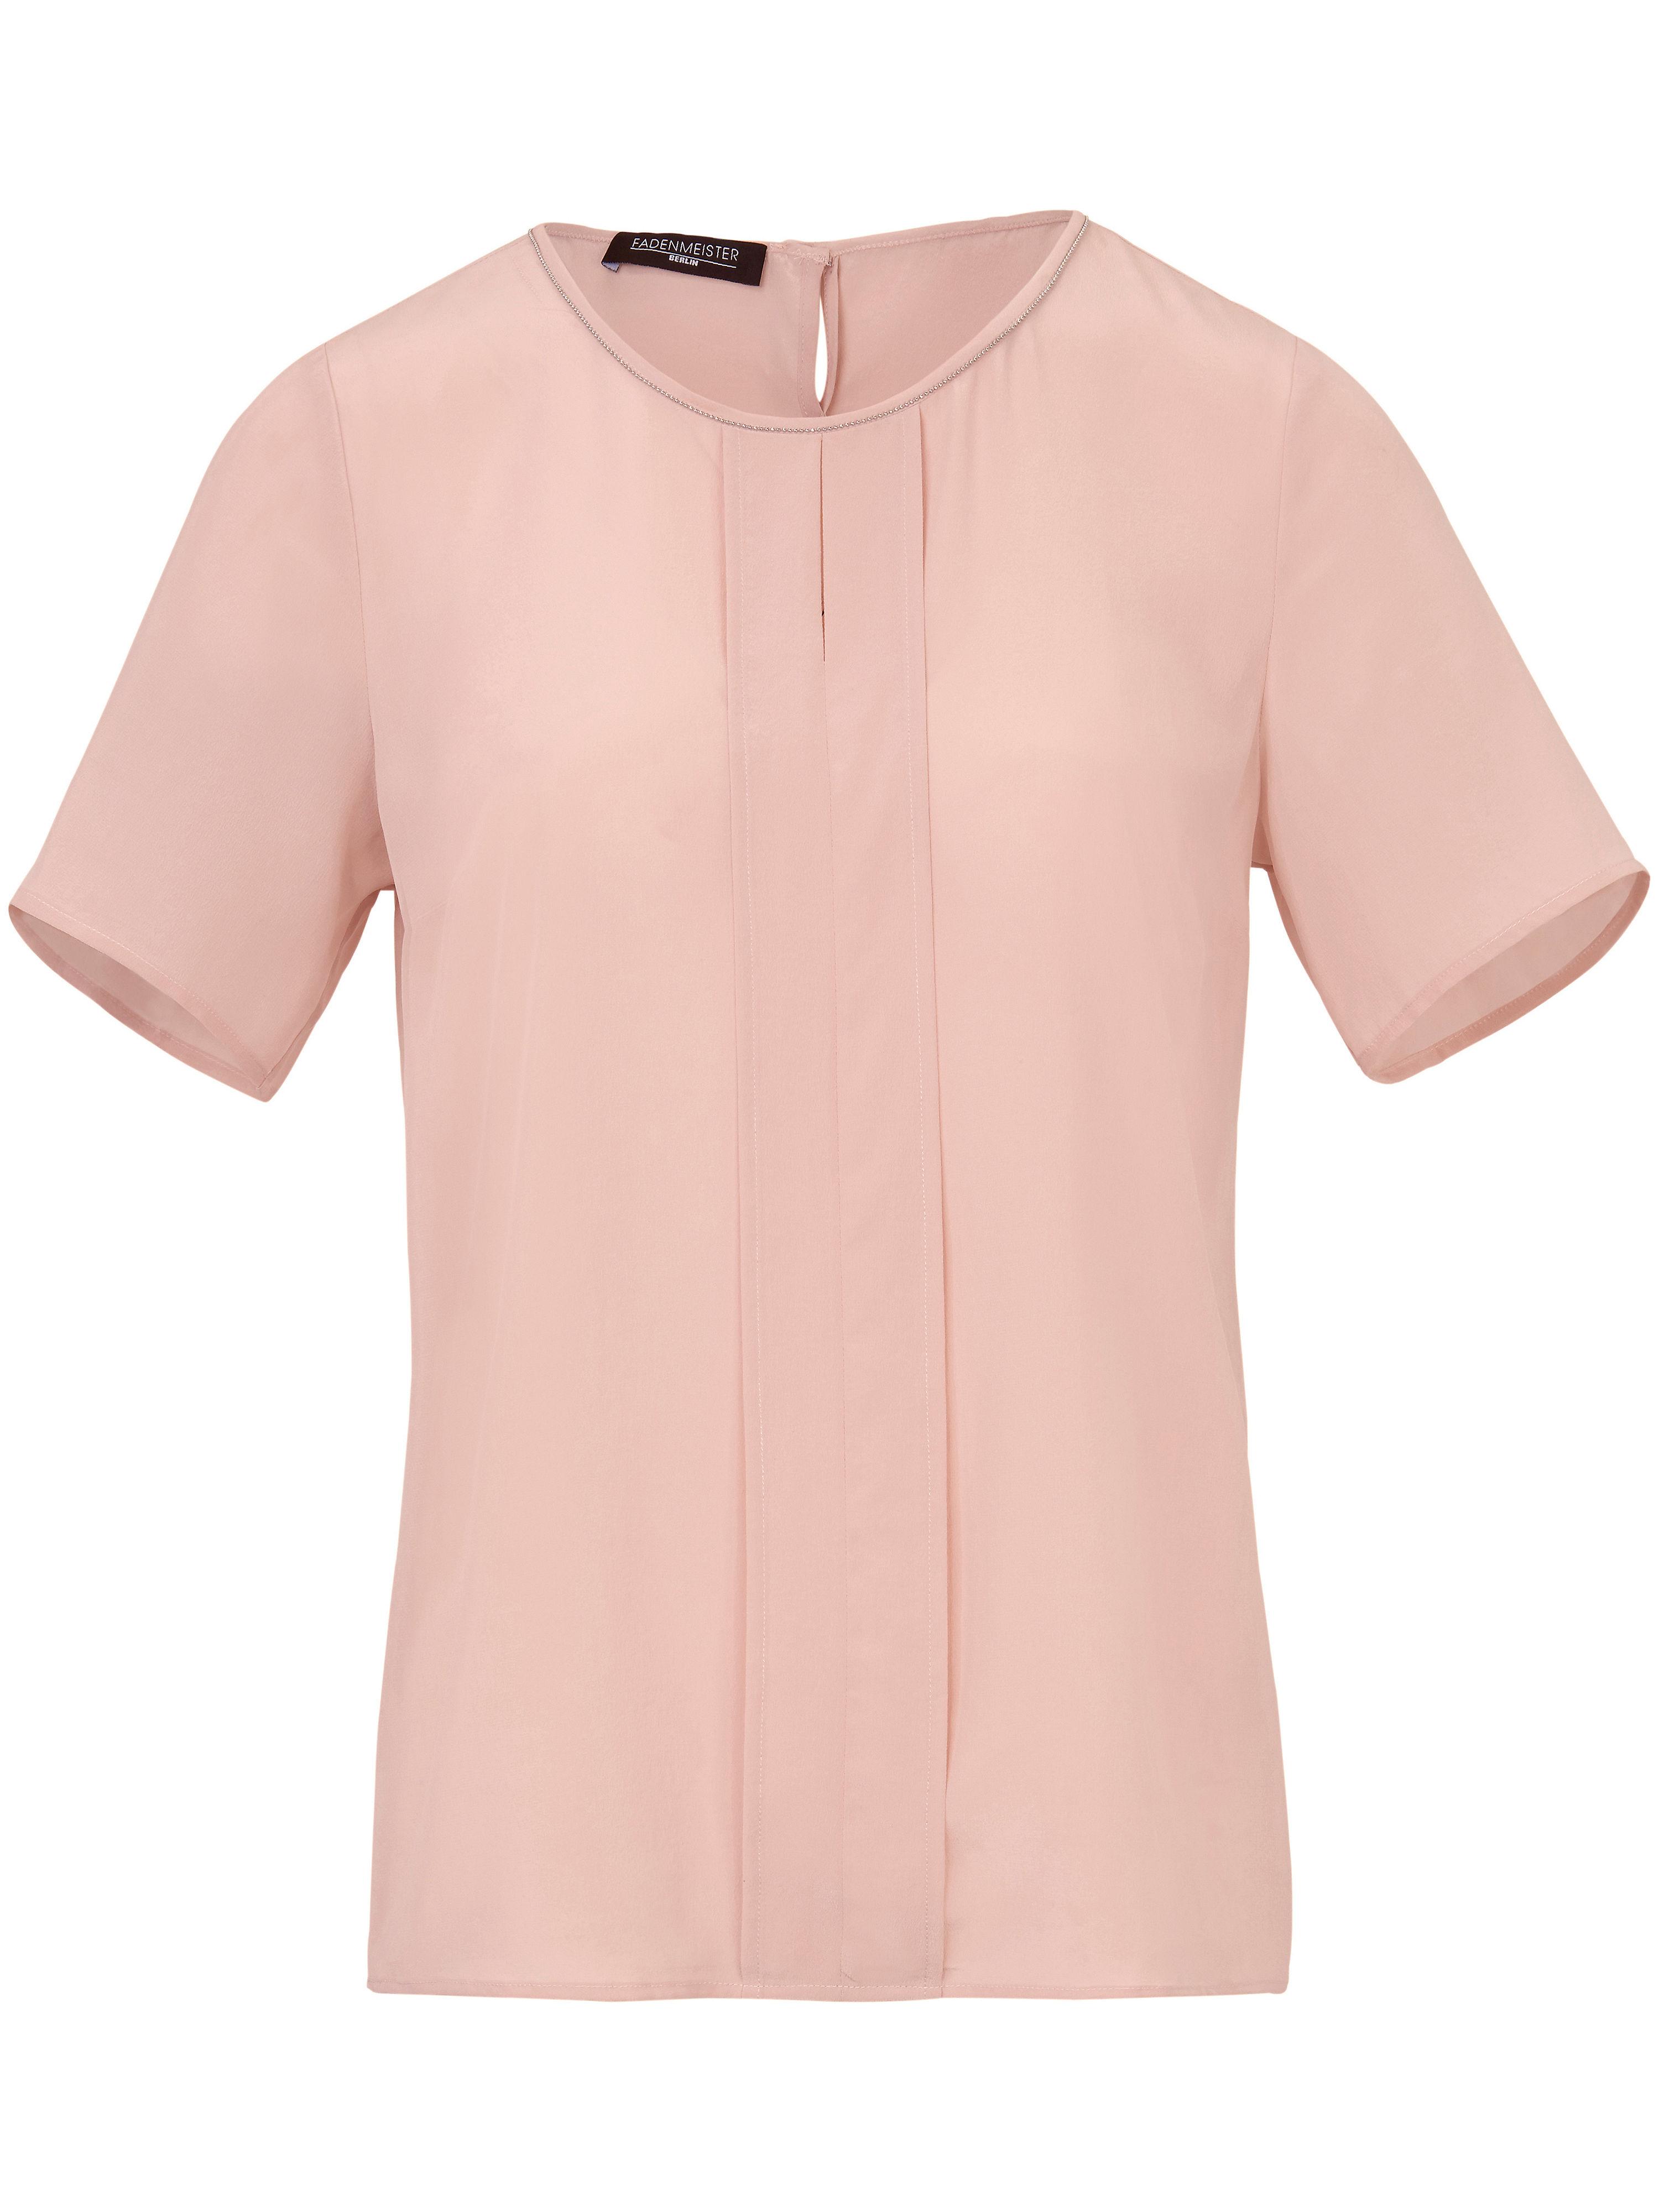 Image of   Skjorte 100% silke Fra Fadenmeister Berlin rosé